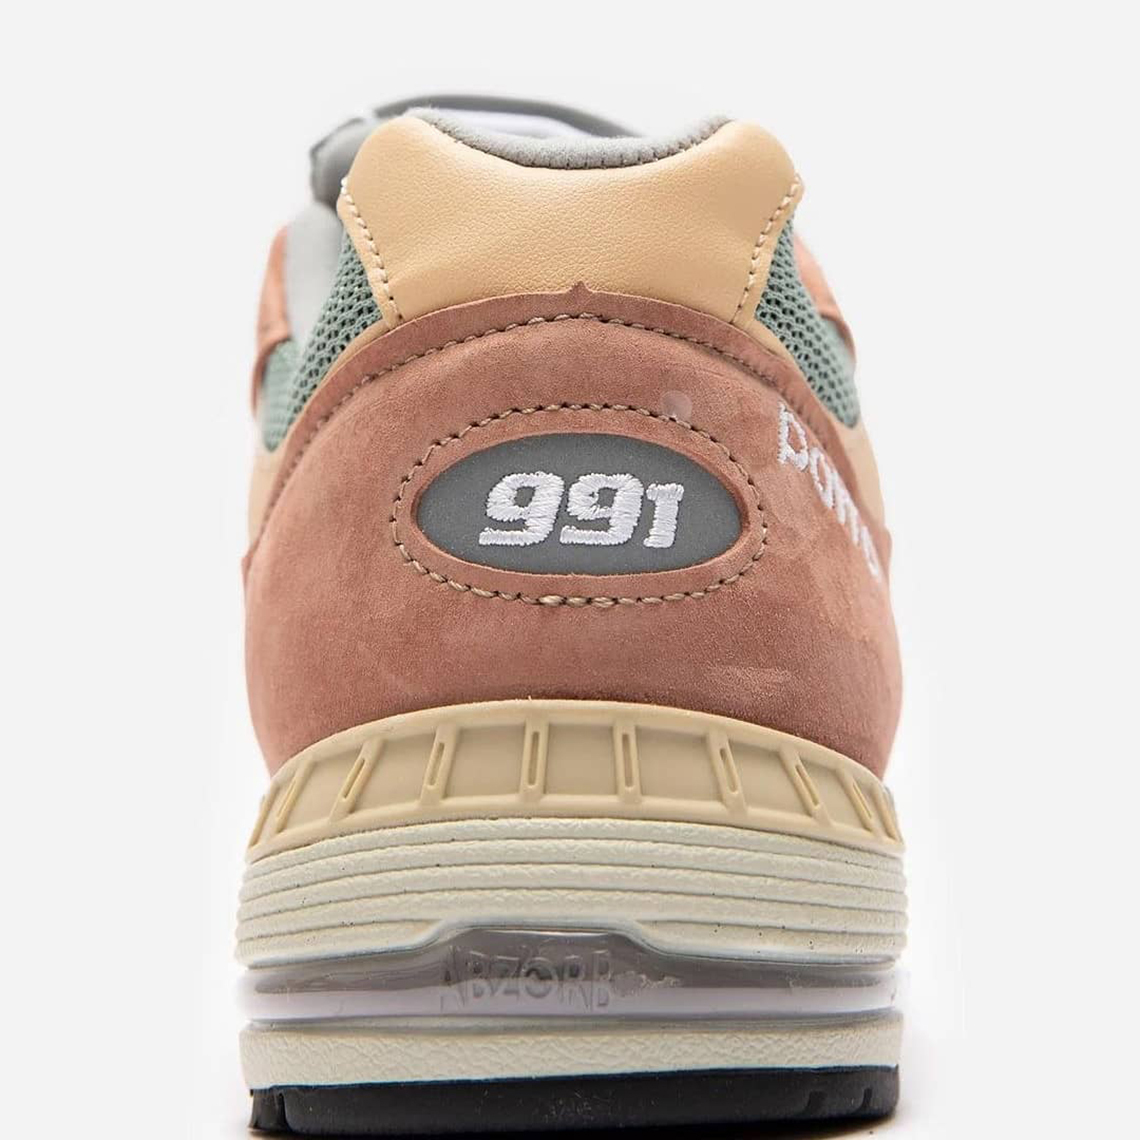 Patta x New Balance 991 - M991PAT